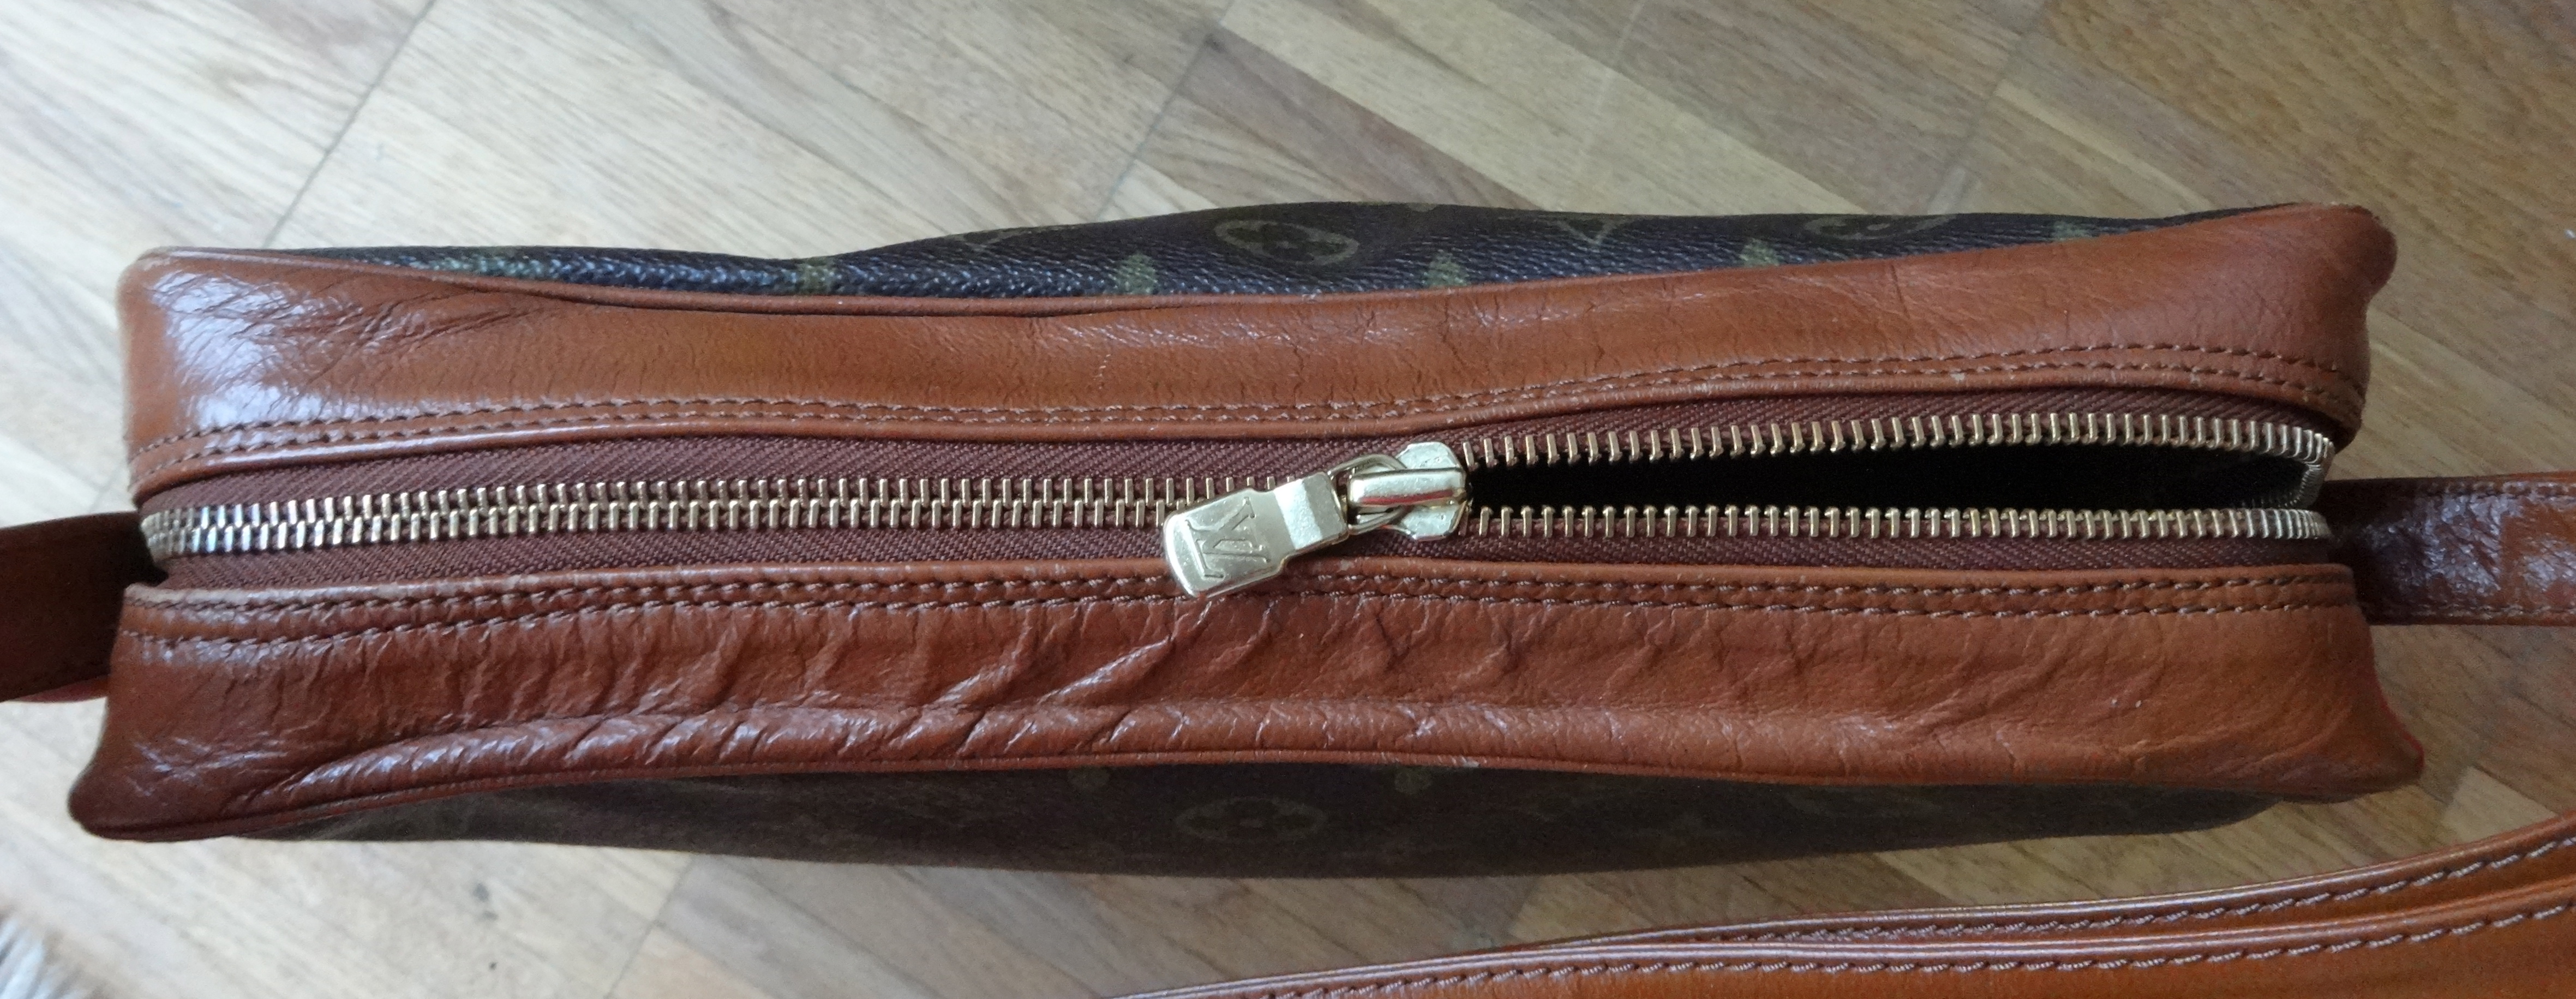 top with zipper - LV Bandouliere - Aufsicht mit Reissverschluss